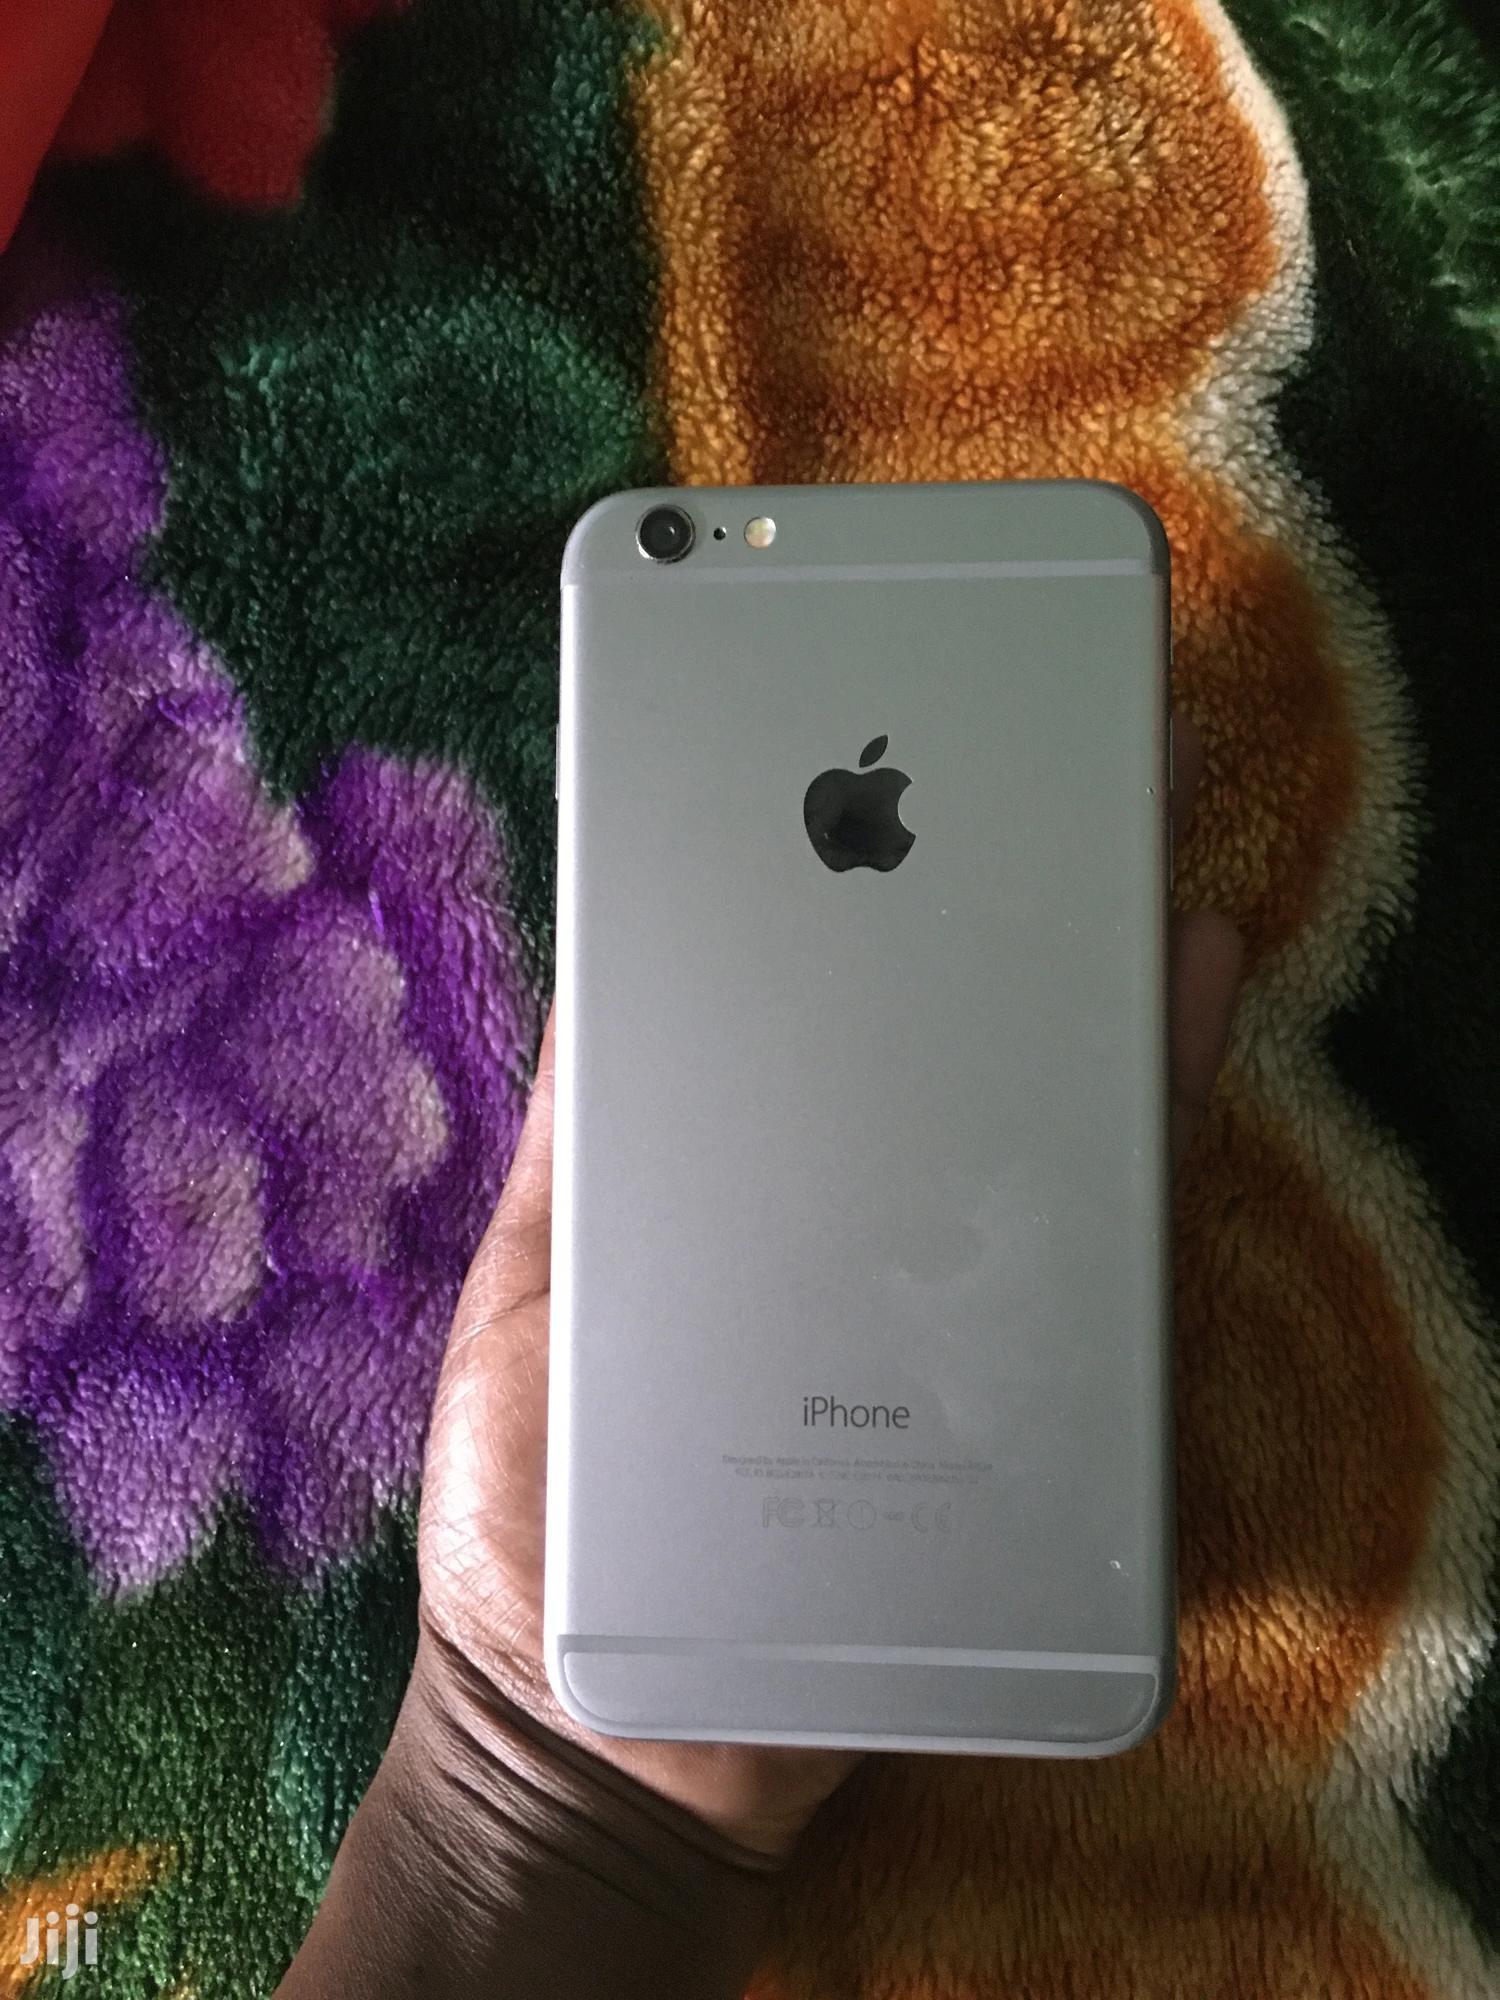 Archive: Apple iPhone 6 Plus 16 GB Gray